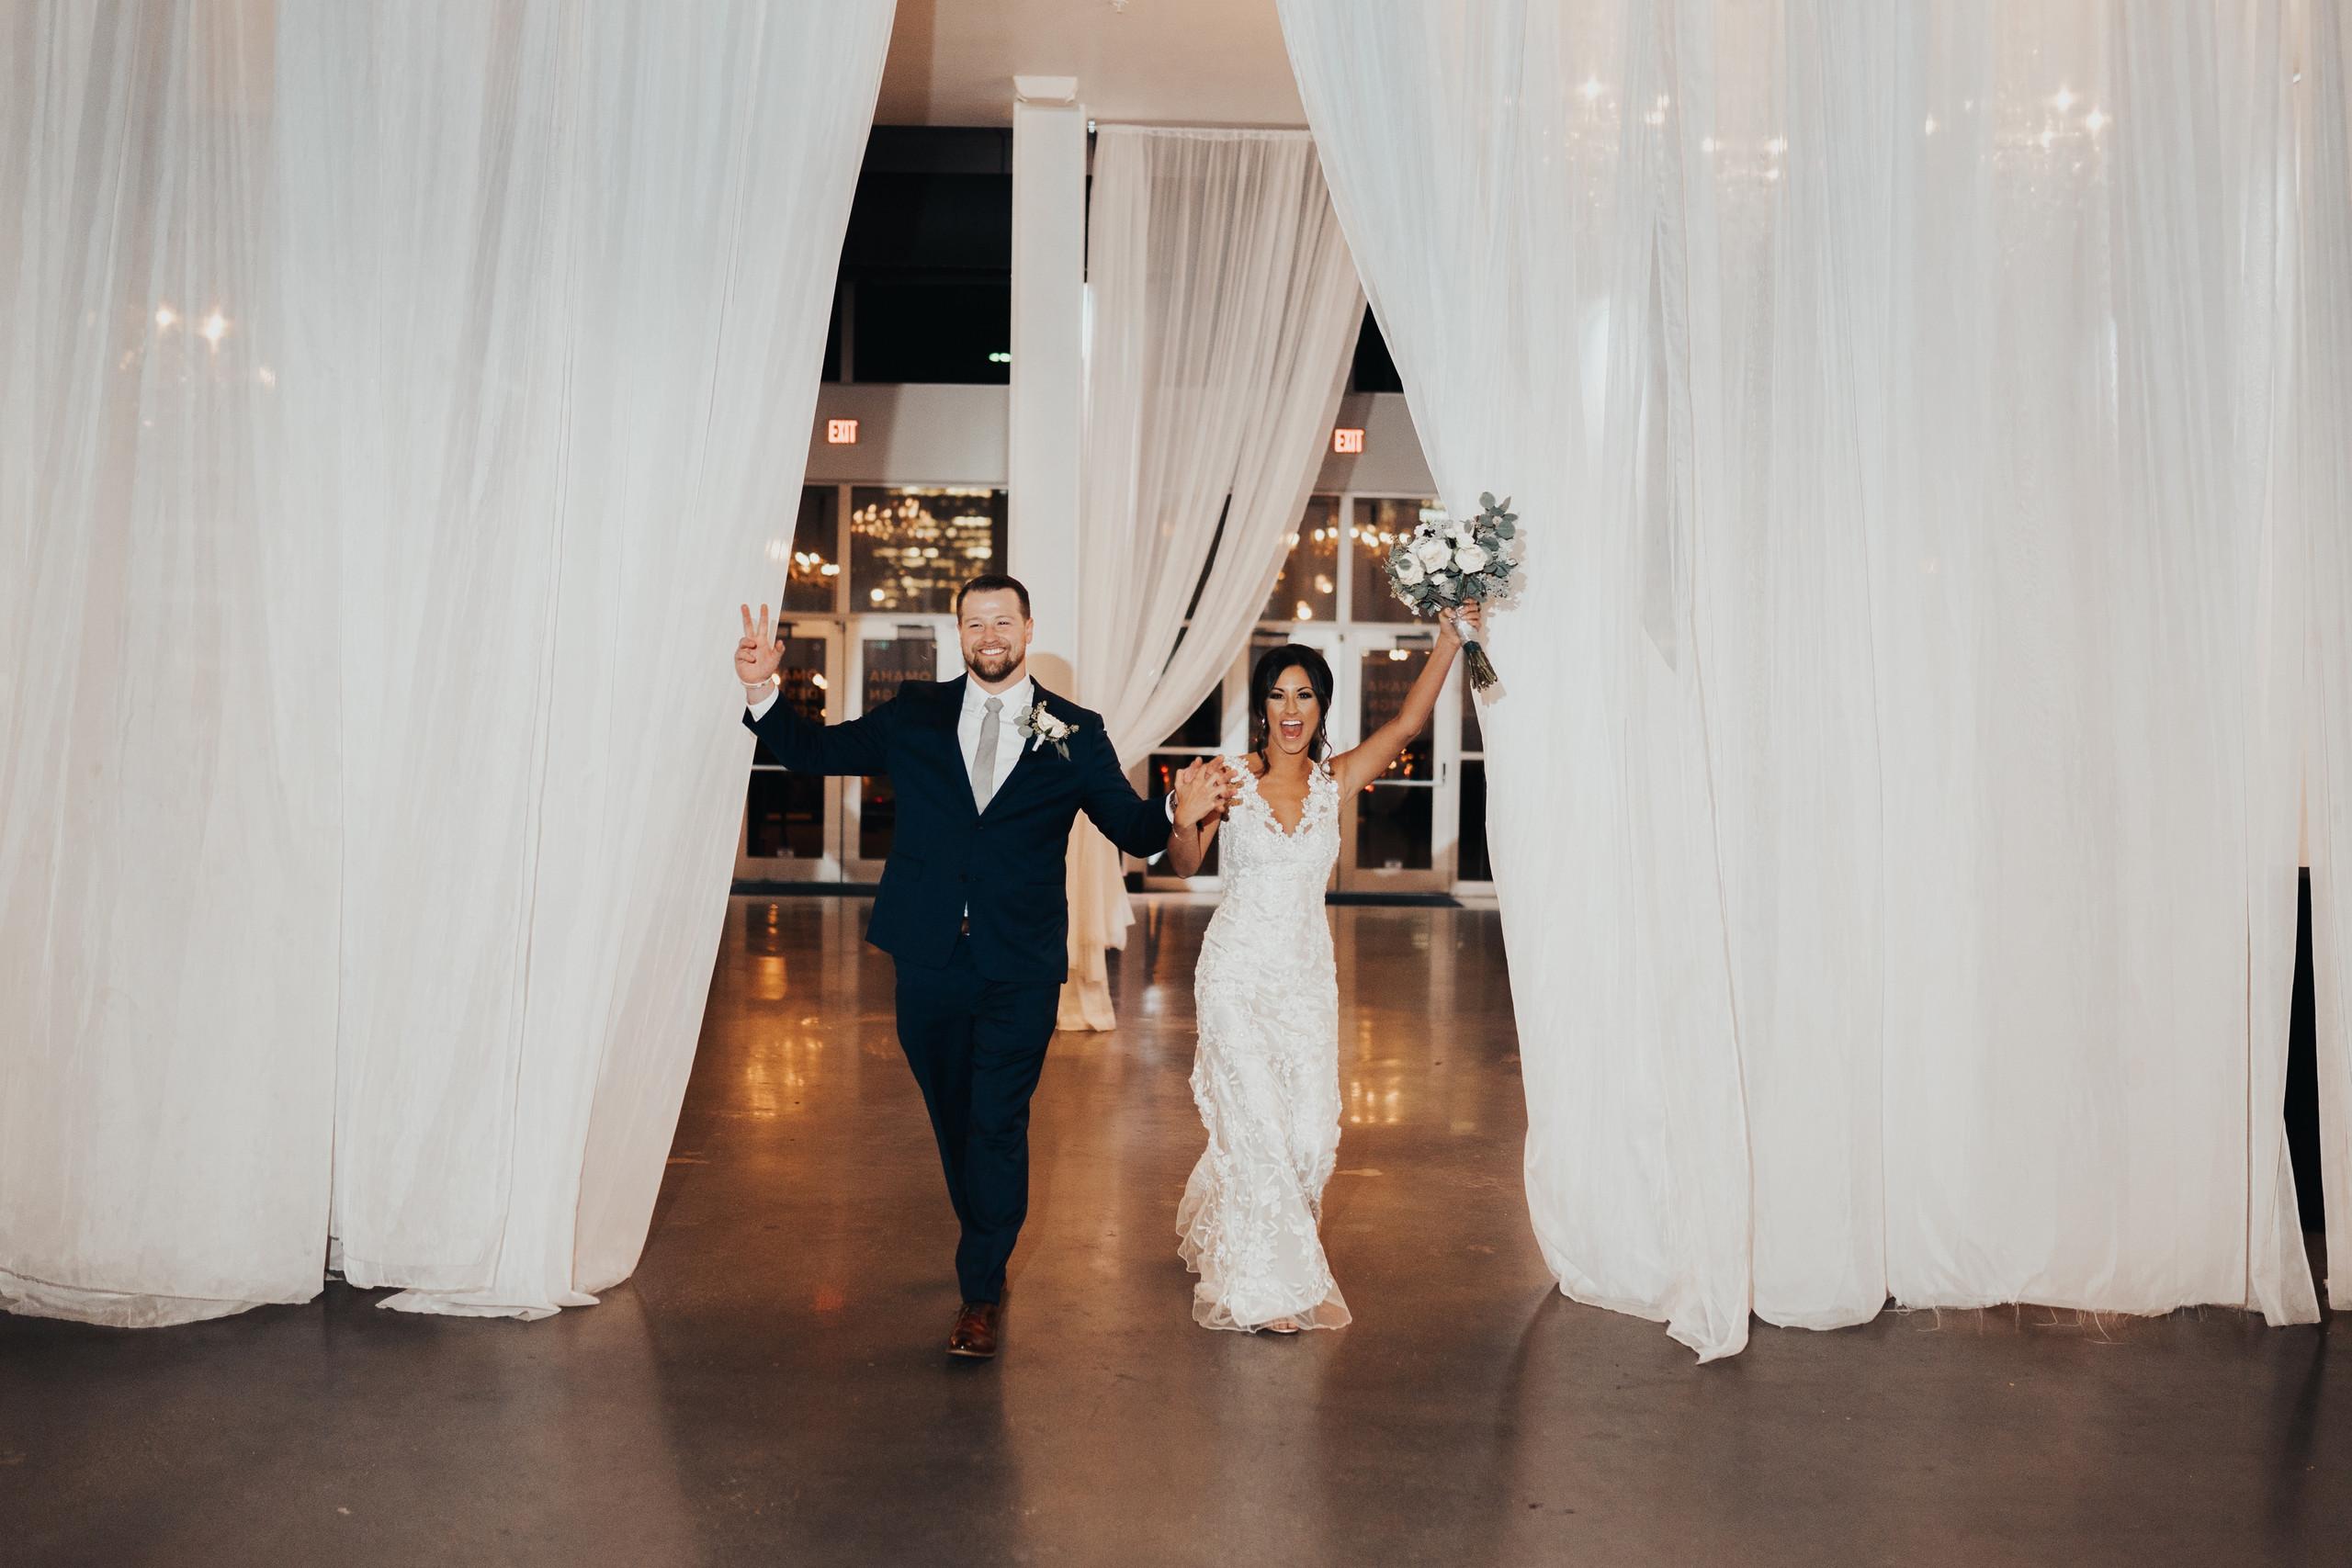 omaha wedding at omaha design center